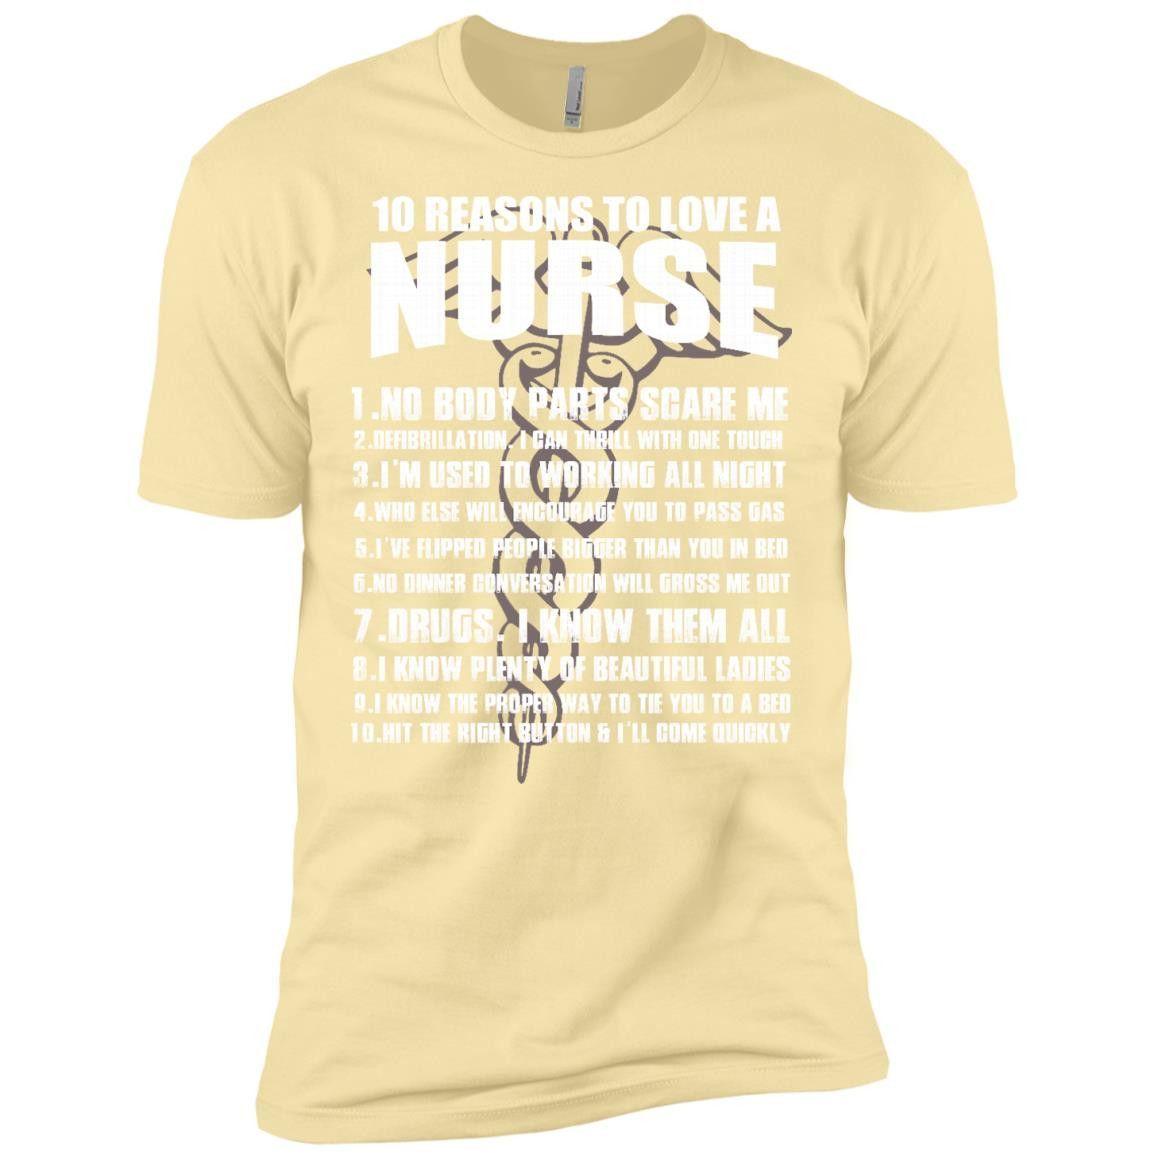 1O REASONS TO LOVE A NURSE NL3600 Next Level Premium Short Sleeve T-Shirt